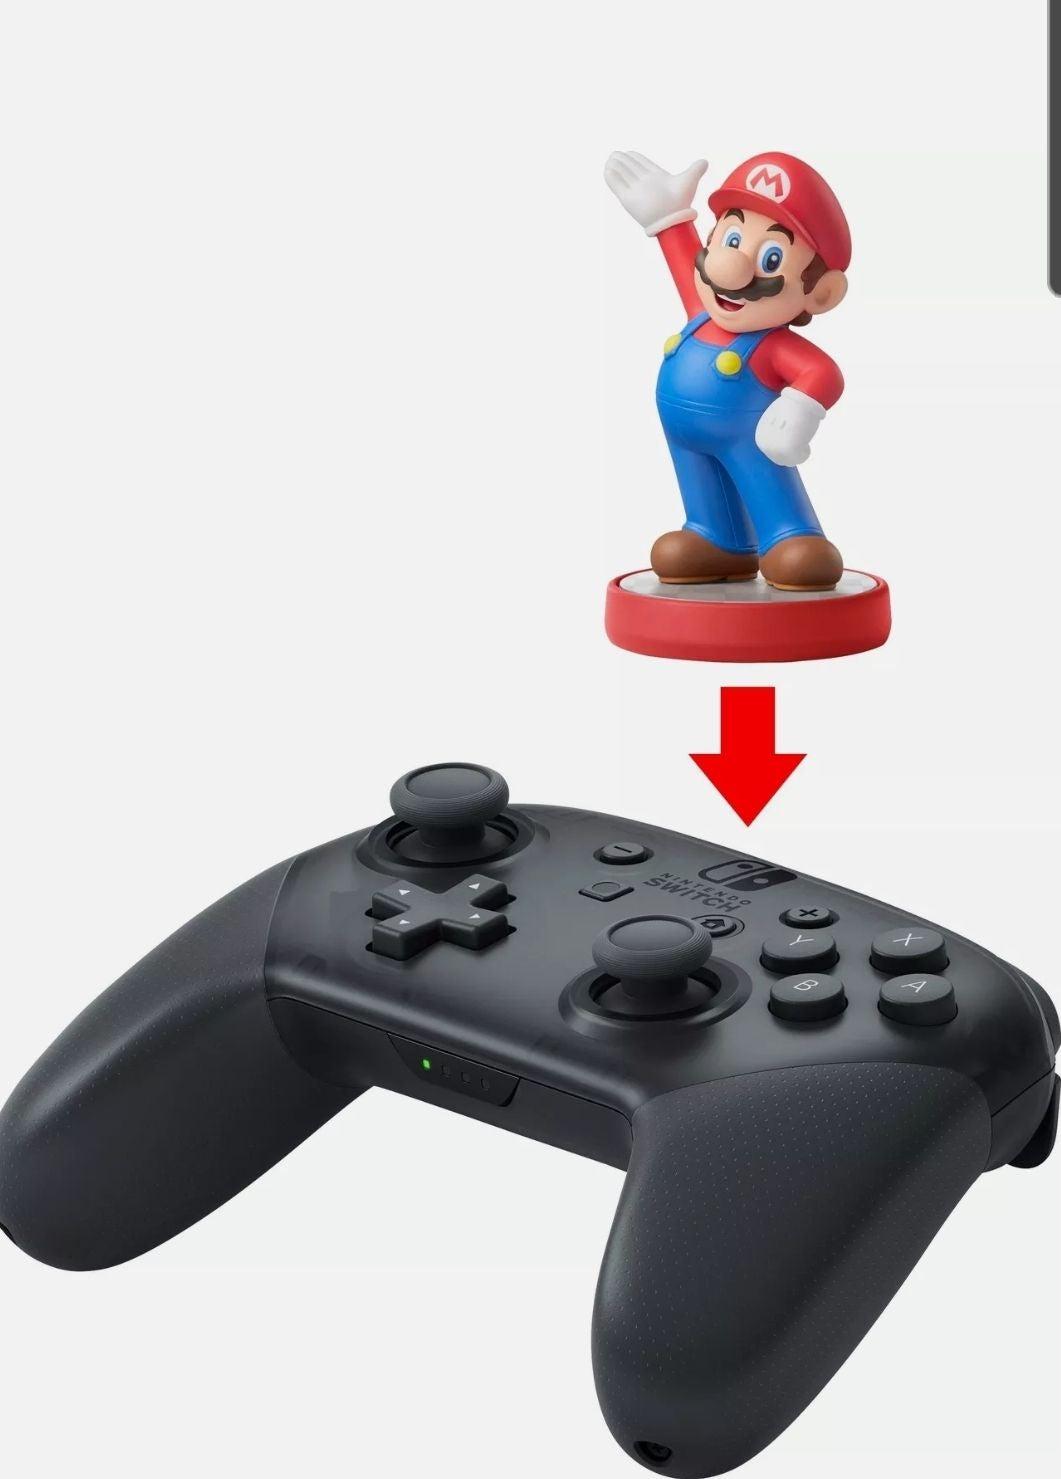 Pro Wireless Controller for Nintendo Swi